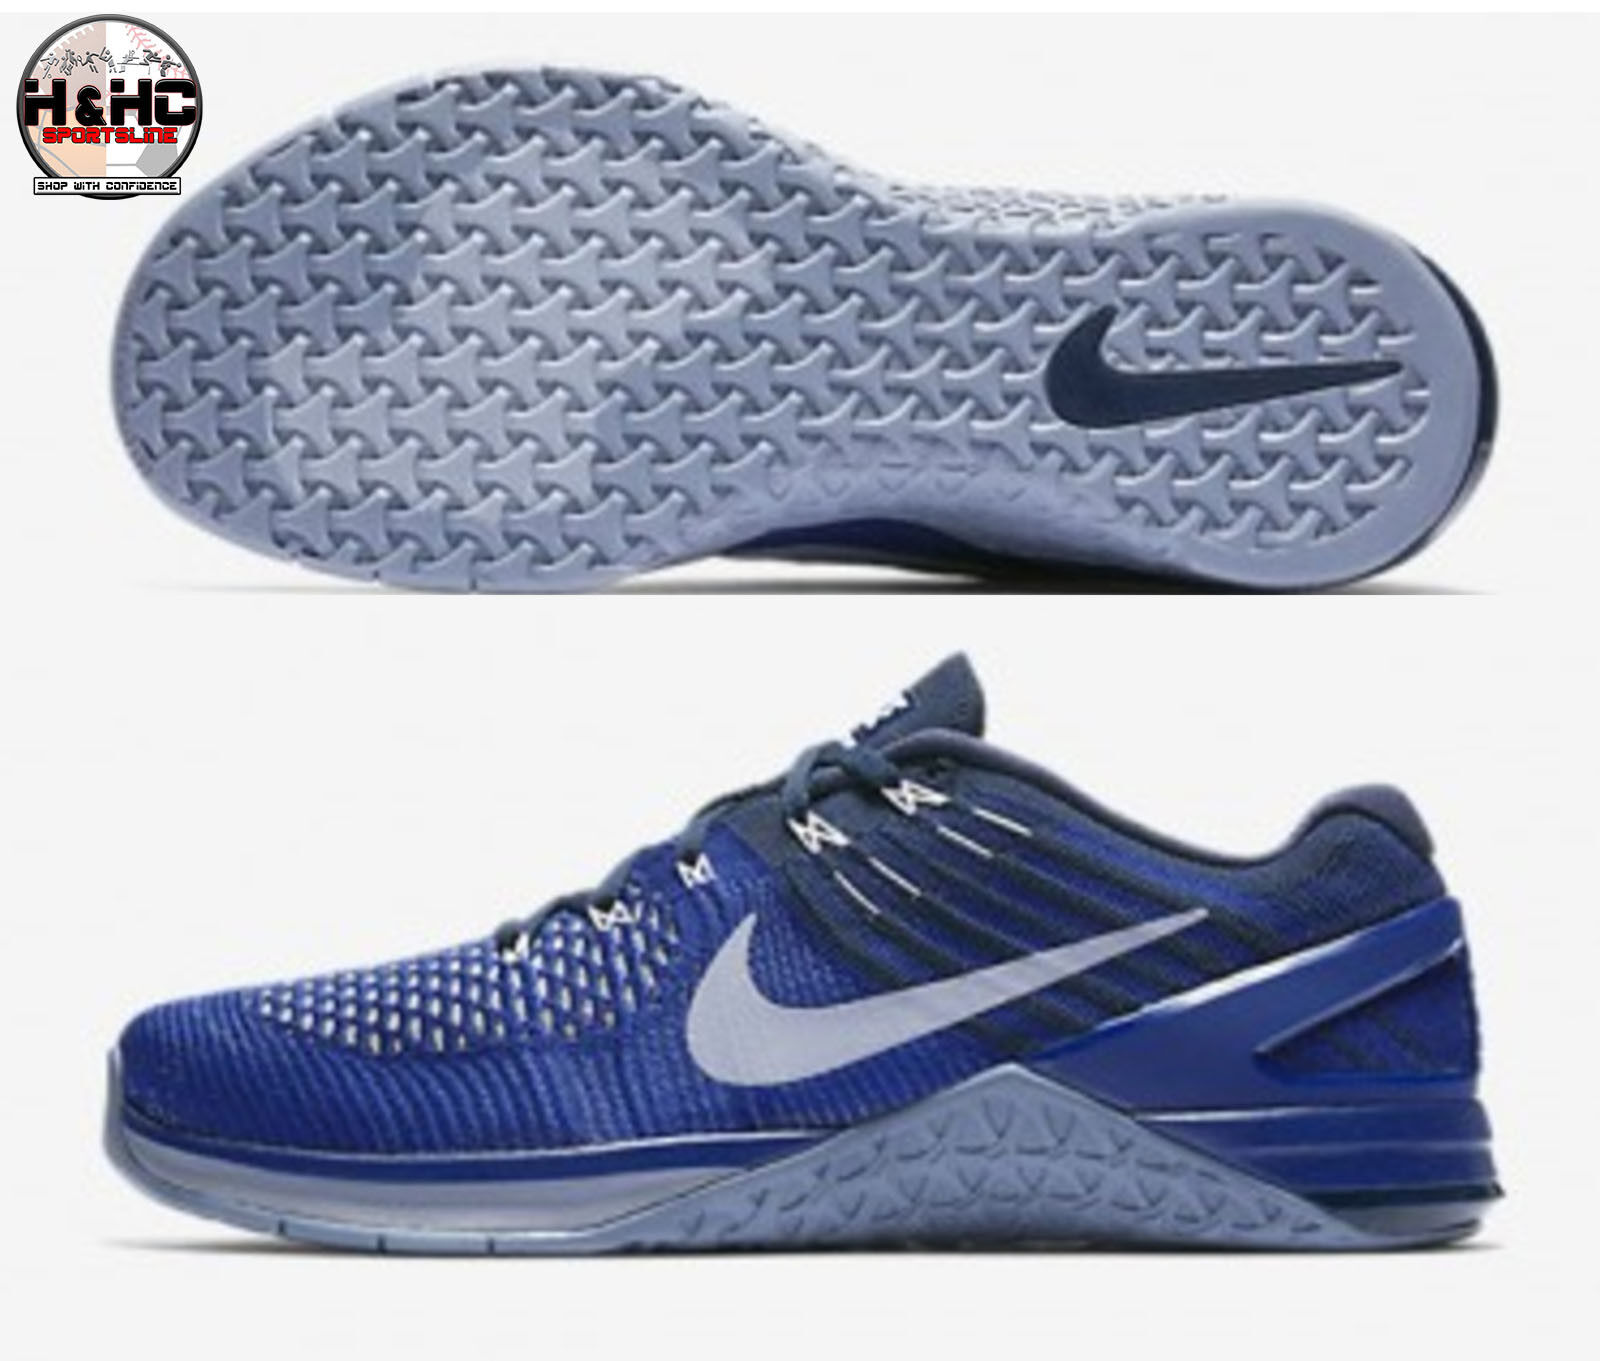 Nike Nike Nike metcon dsx flyknit 852930 403 royal Blau / blaue männer trainingsschuh sz. d5c710